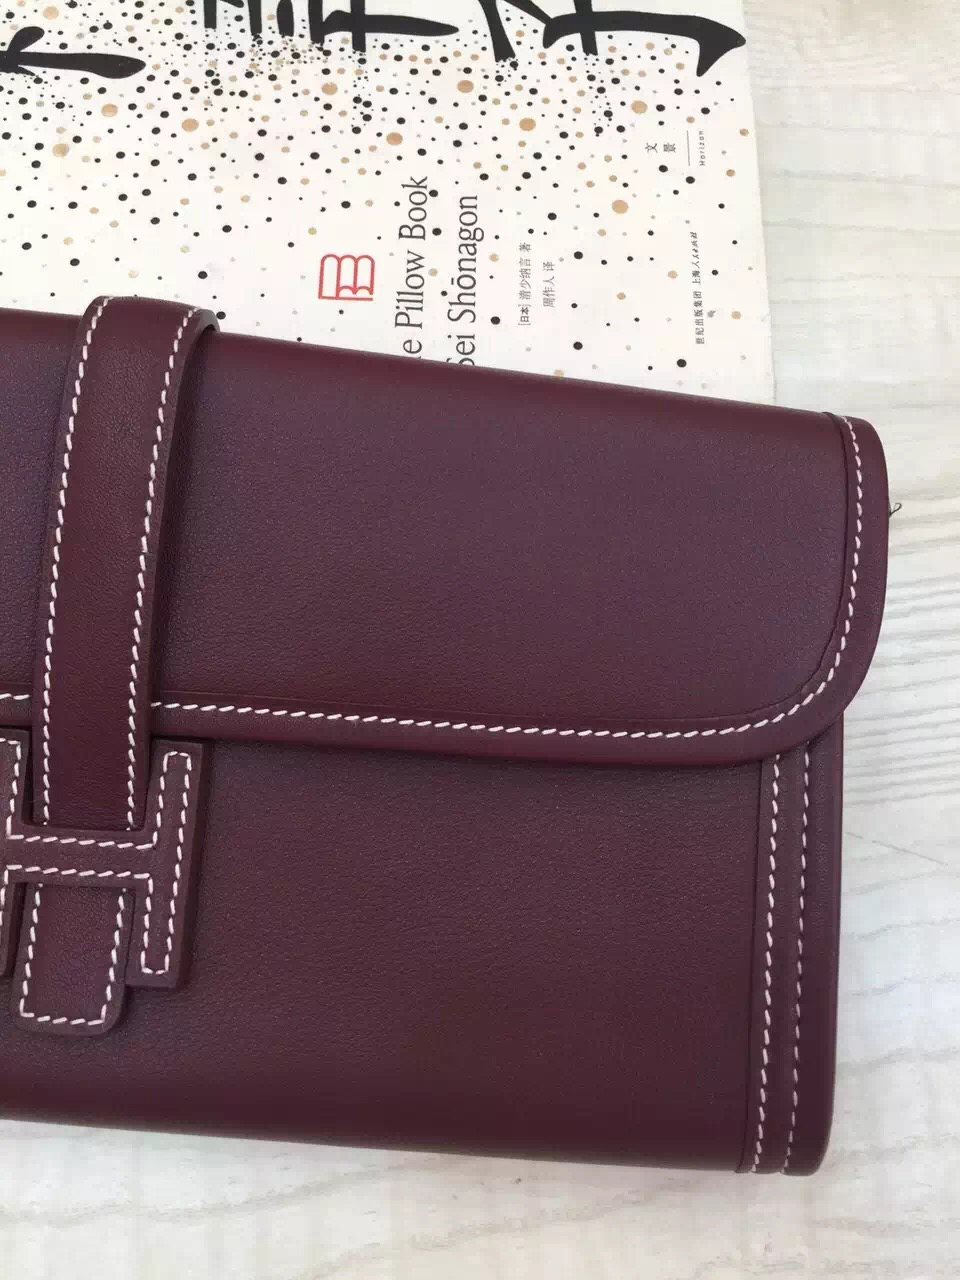 Hand Stitching Hermes 57 Bordeaux Swift Leather Jige Elan Clutch Bag